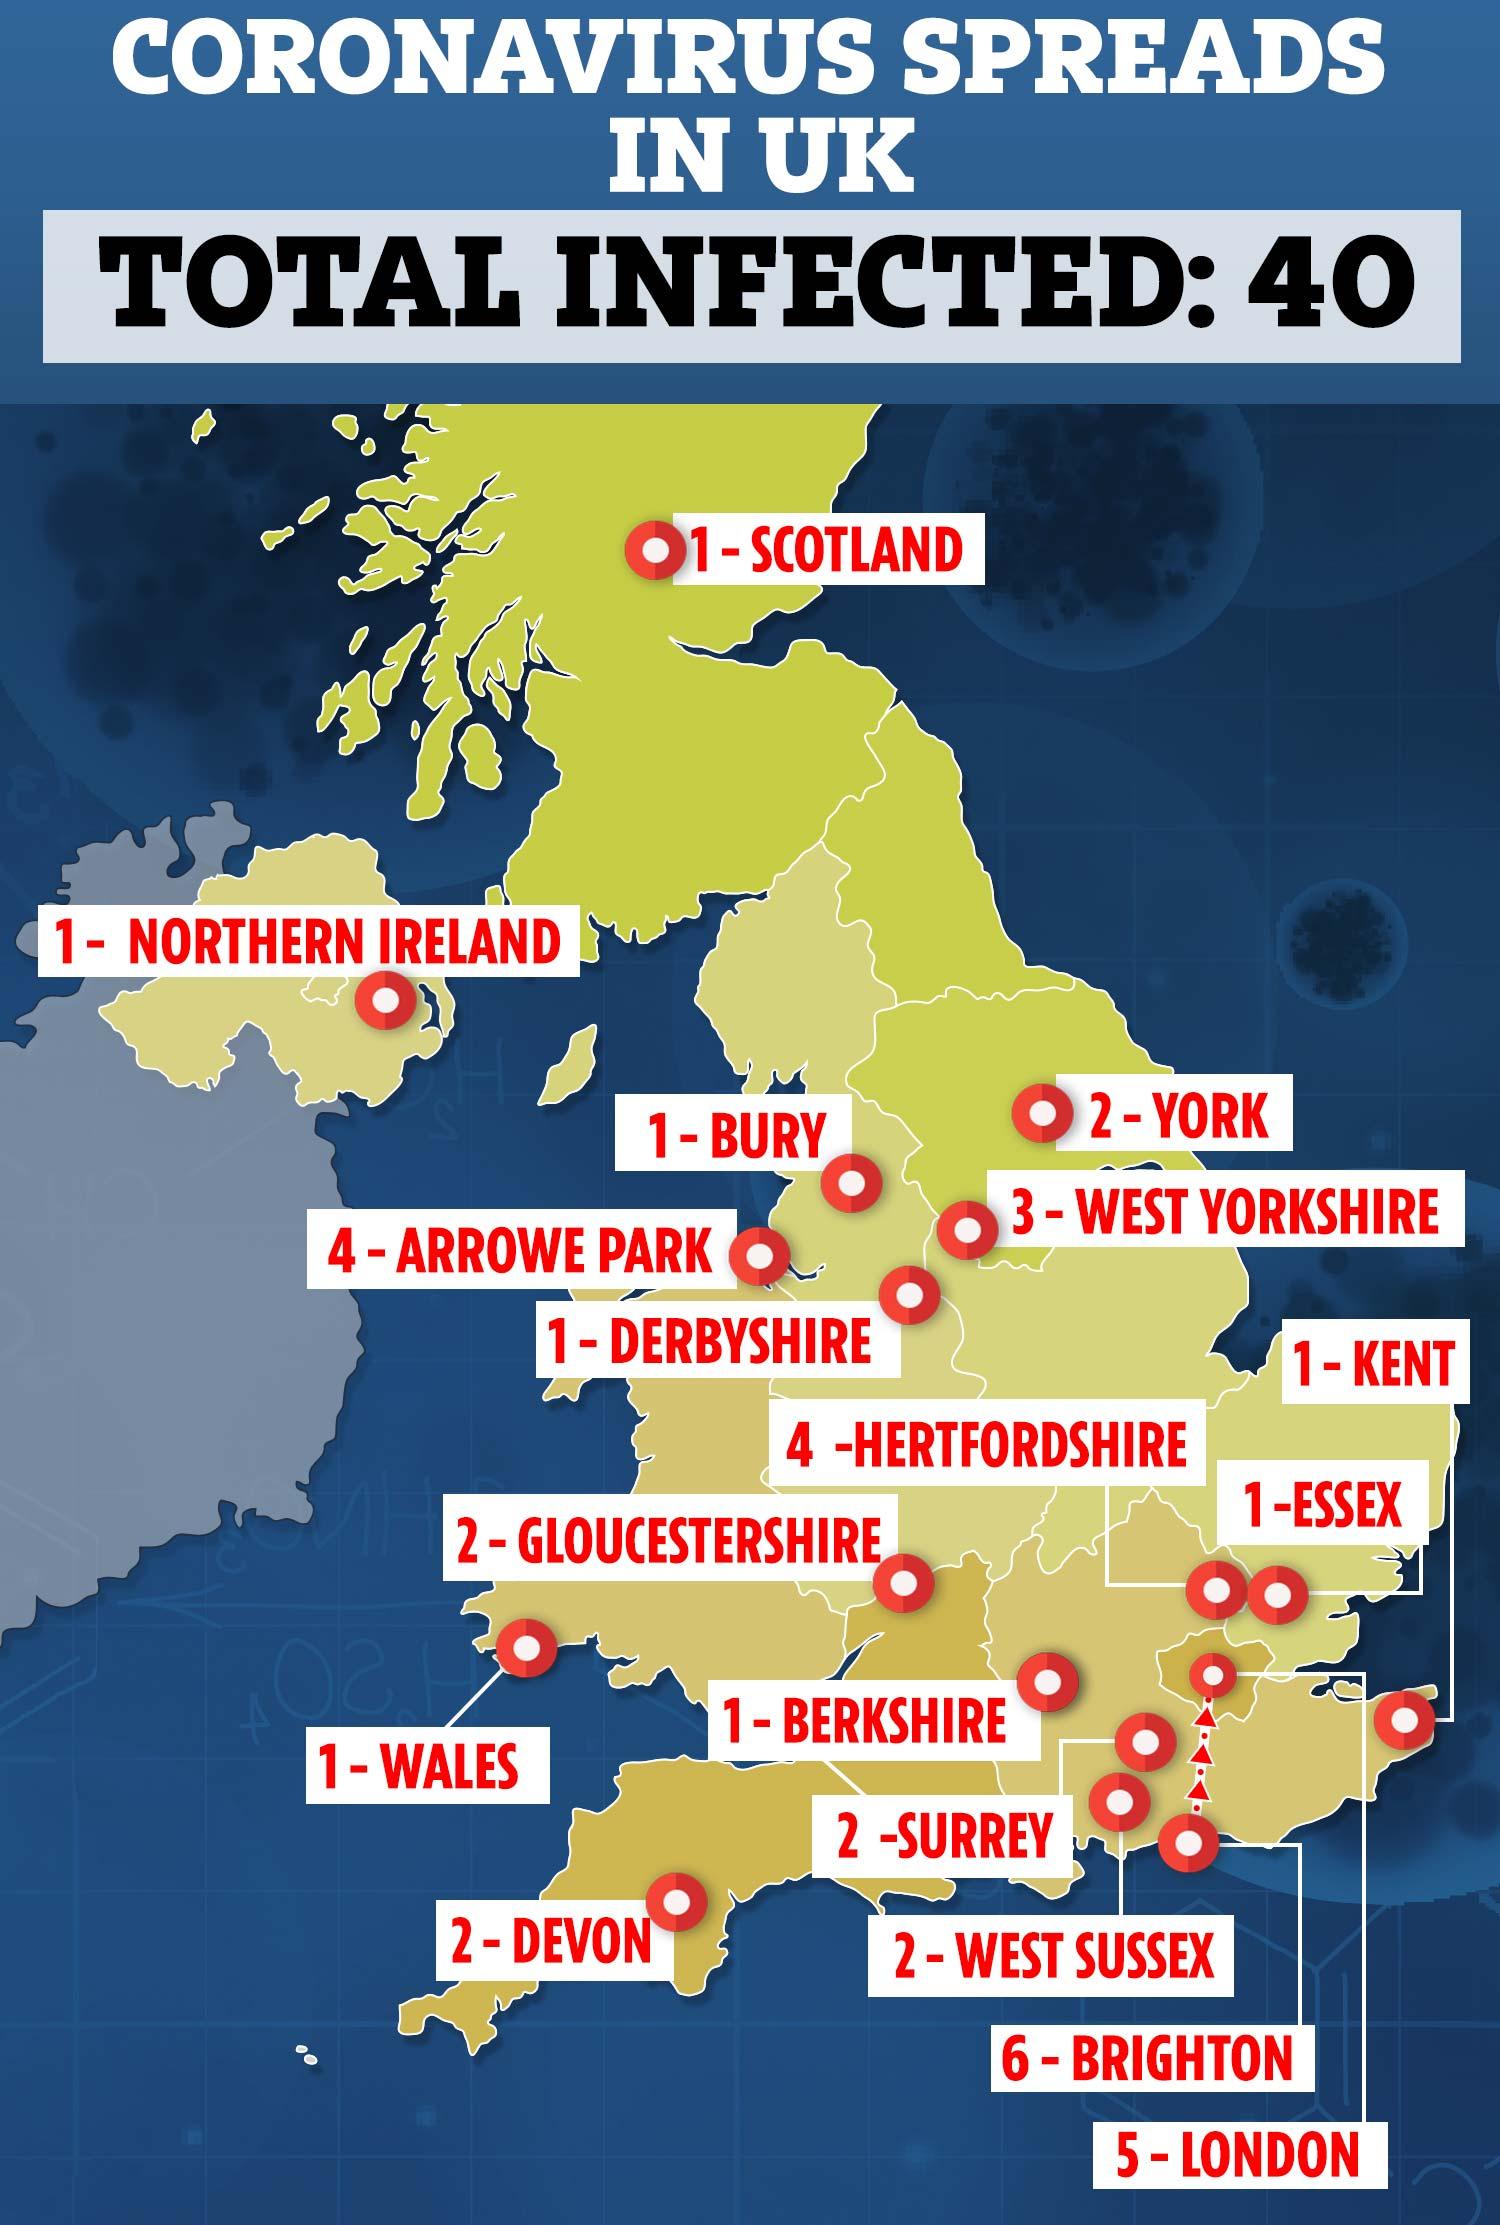 Coronavirus superspreader fears grip Surrey commuter town featured ...